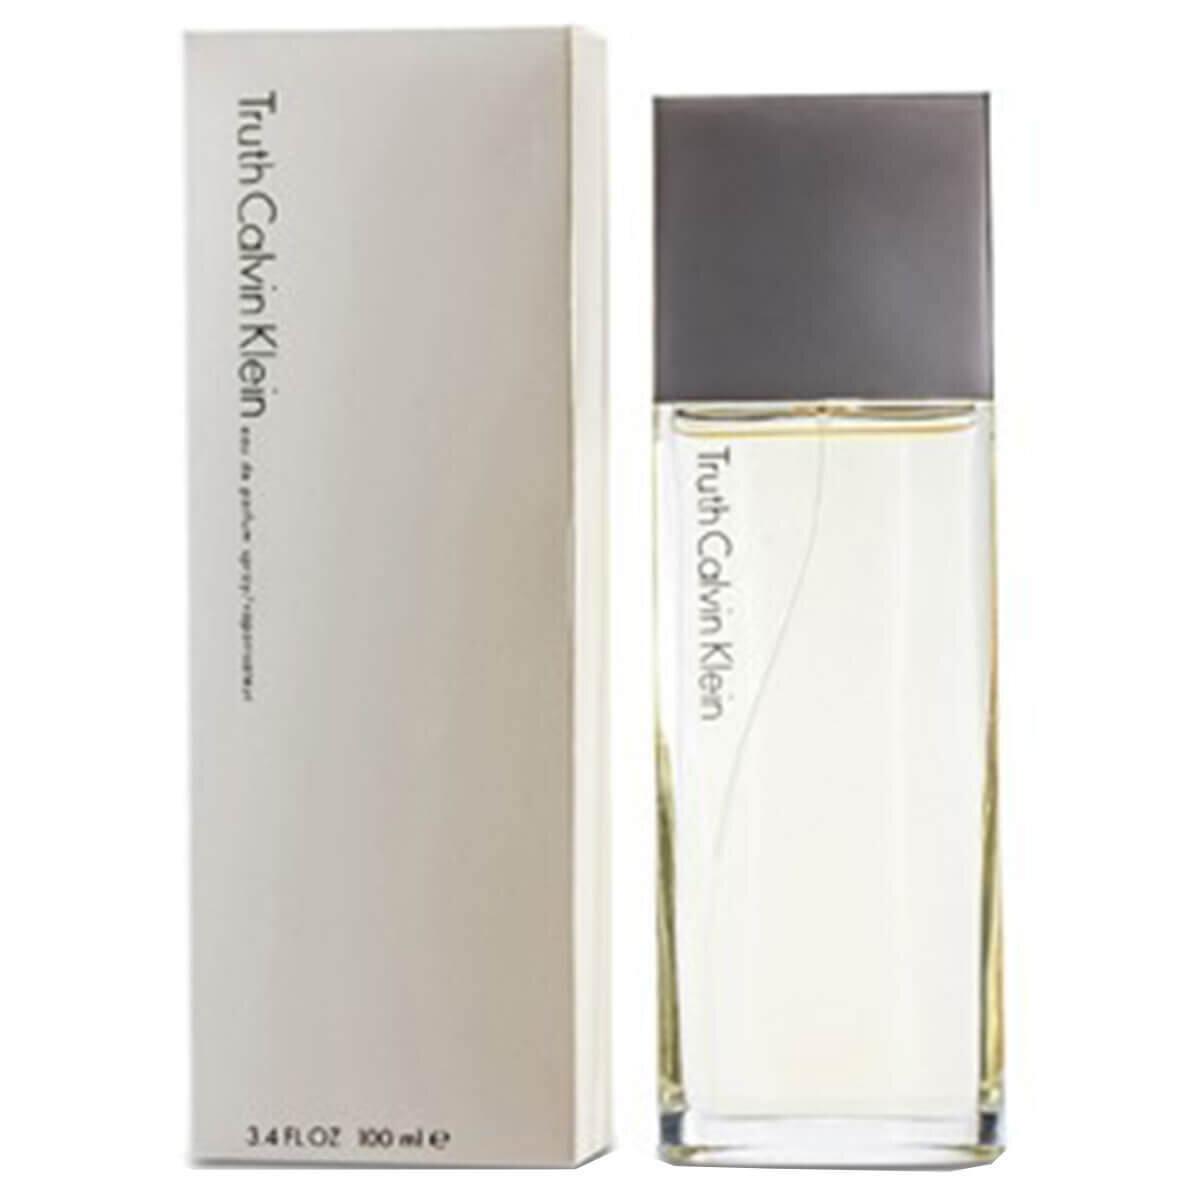 CALVIN KLEIN. Truth Femme Edp Kadın Parfüm 100 ml 755d57c760